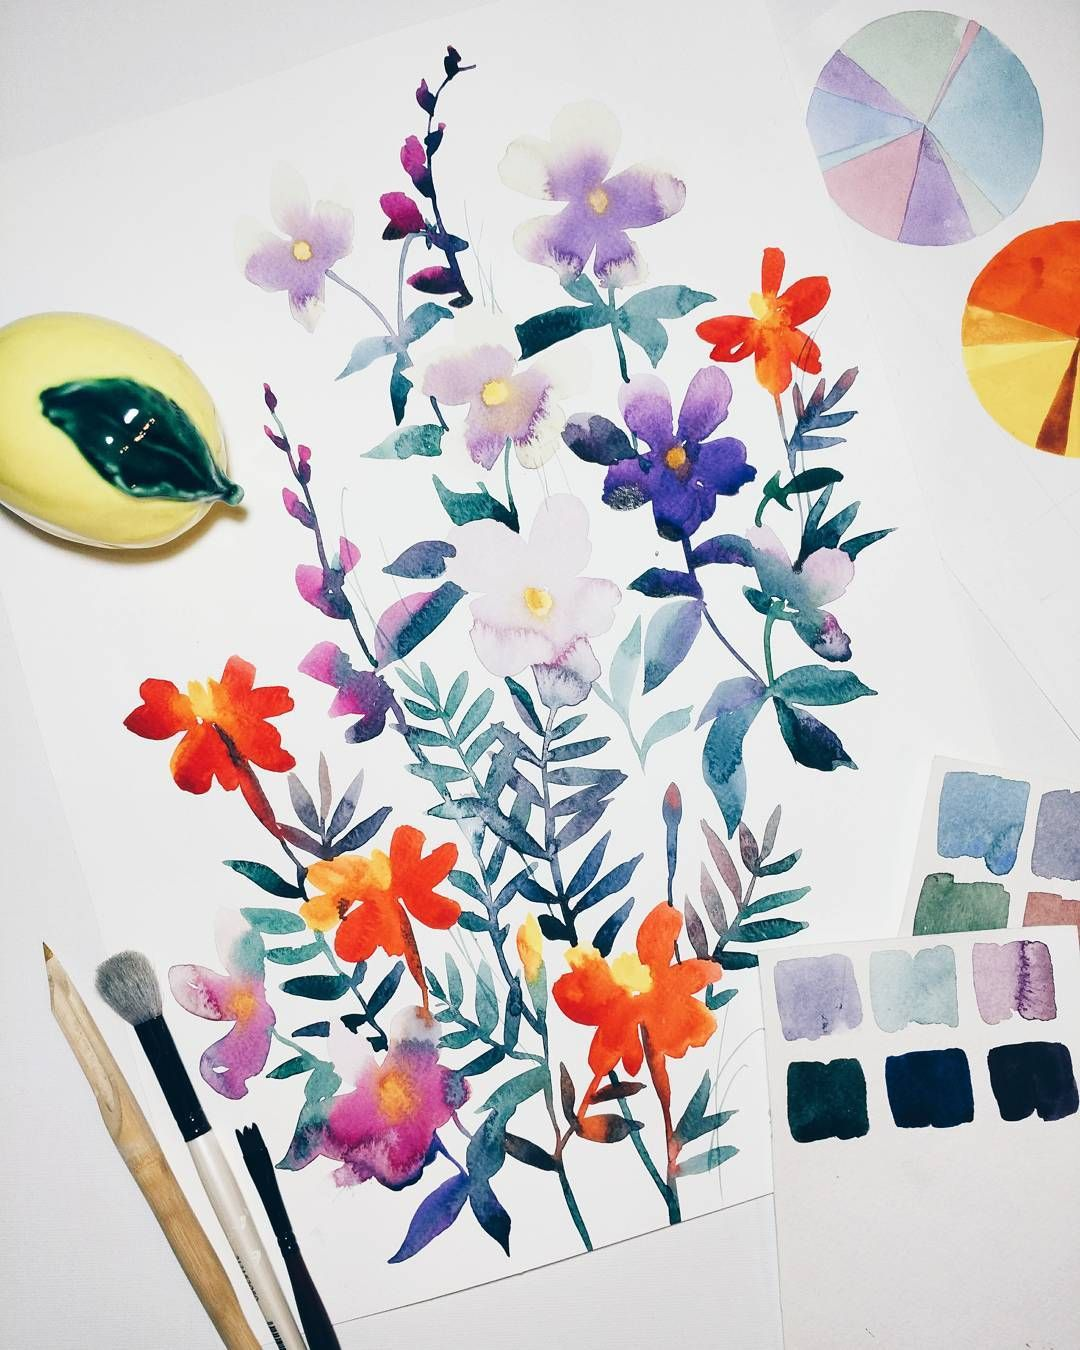 Watercolor Illustrator Gala Kamenskaya Galakamenskaya Flowers